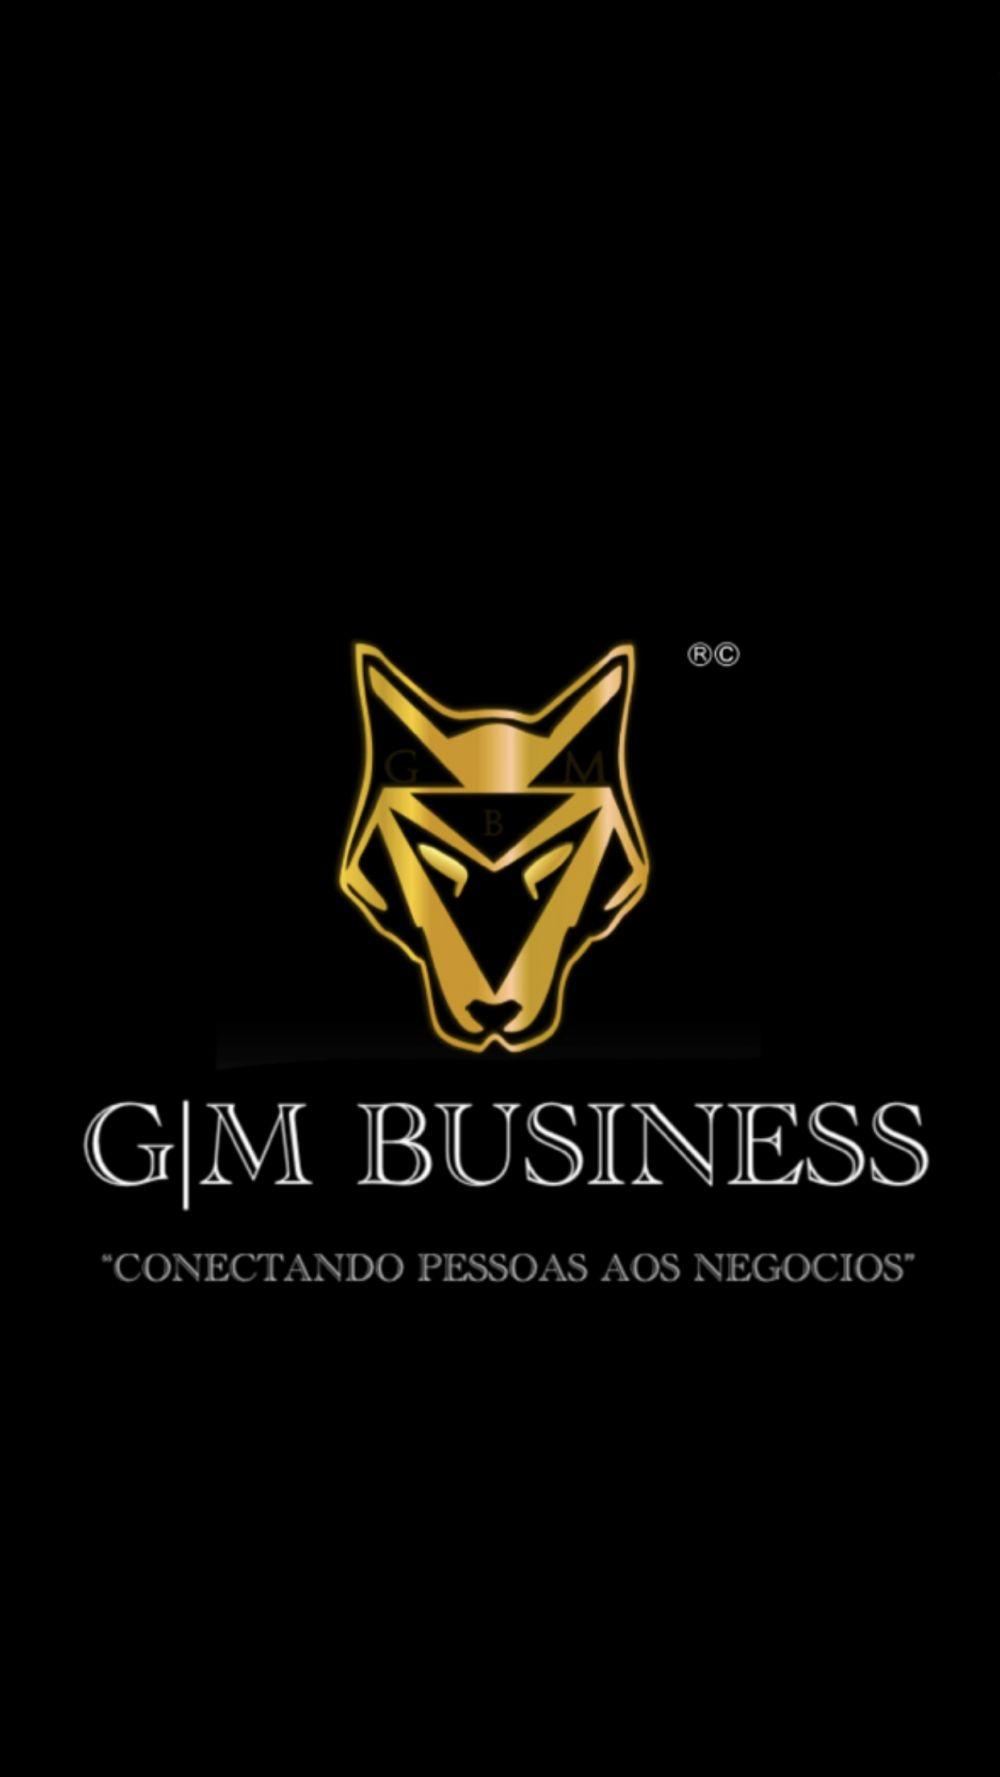 Gm business